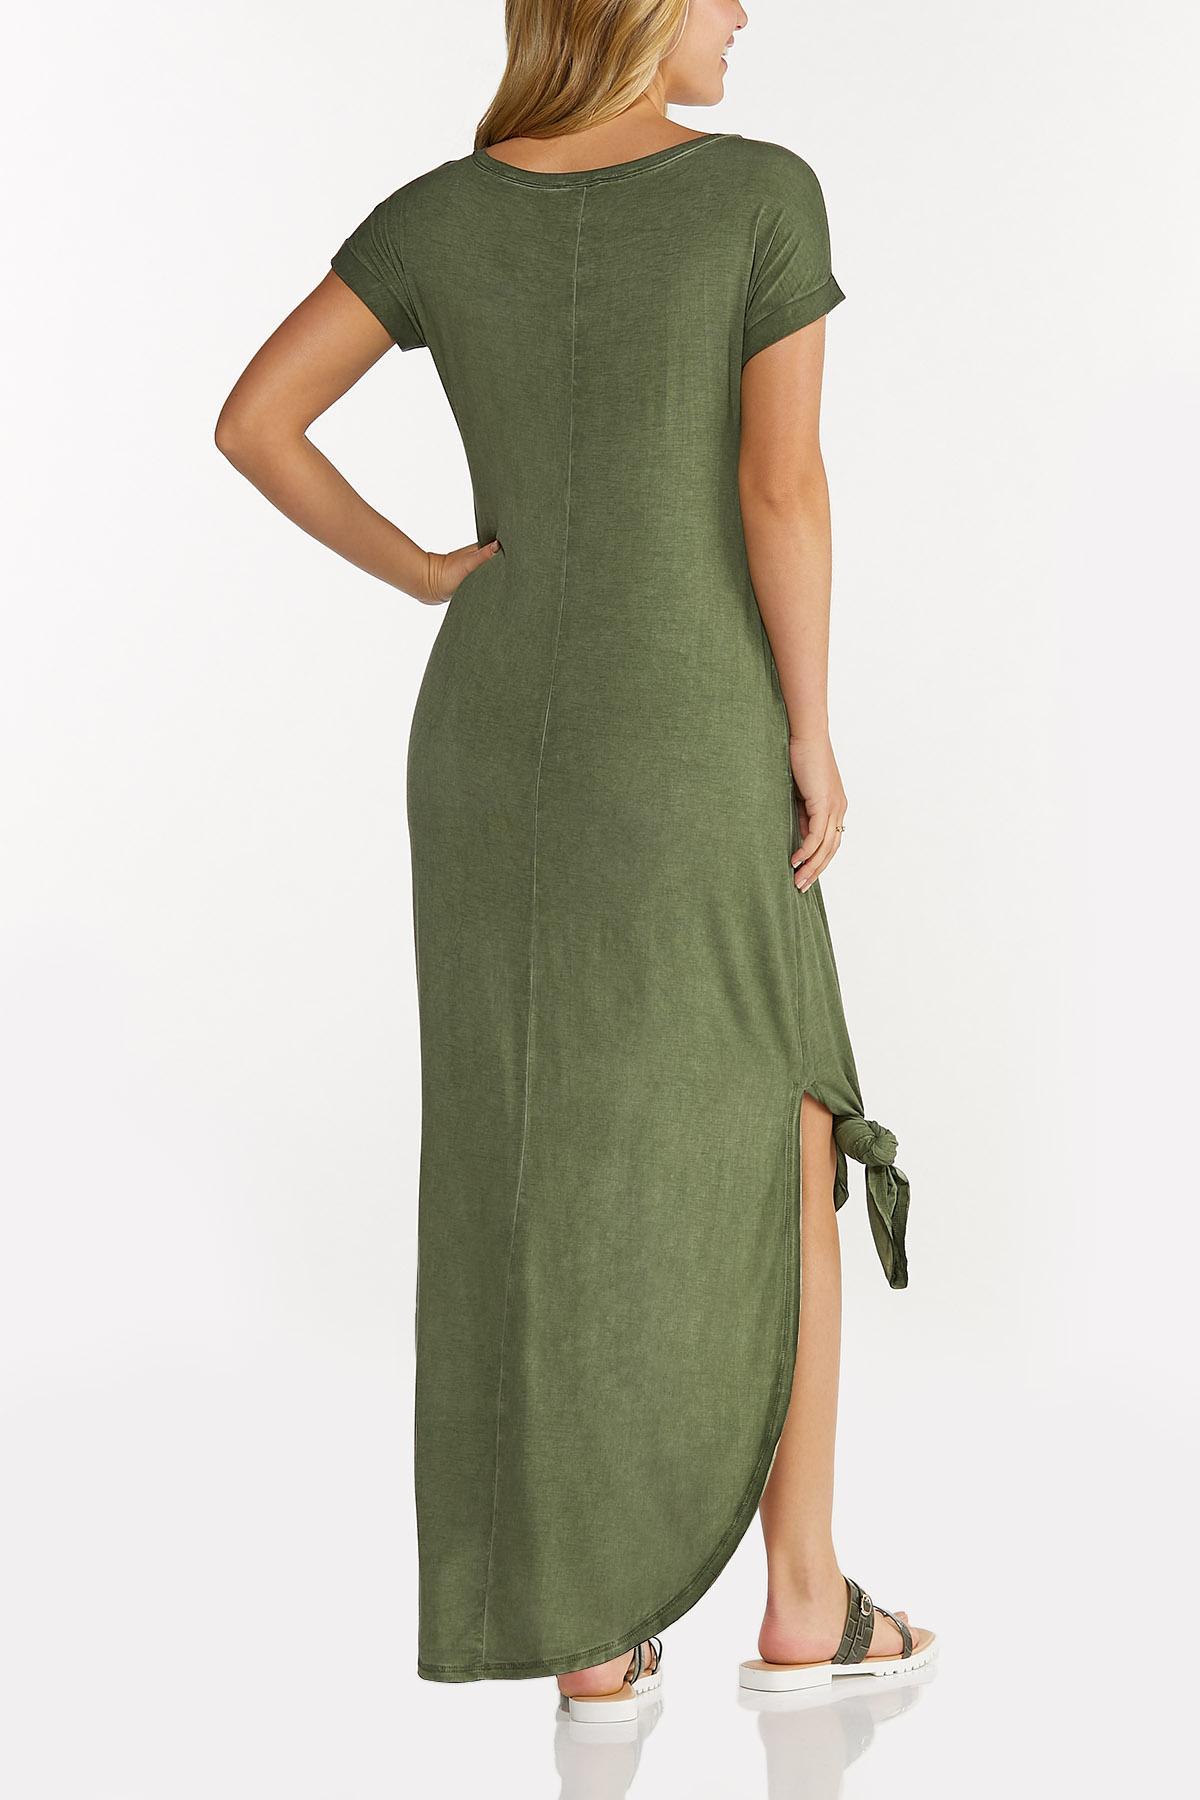 Cutout Tee Maxi Dress (Item #44635329)